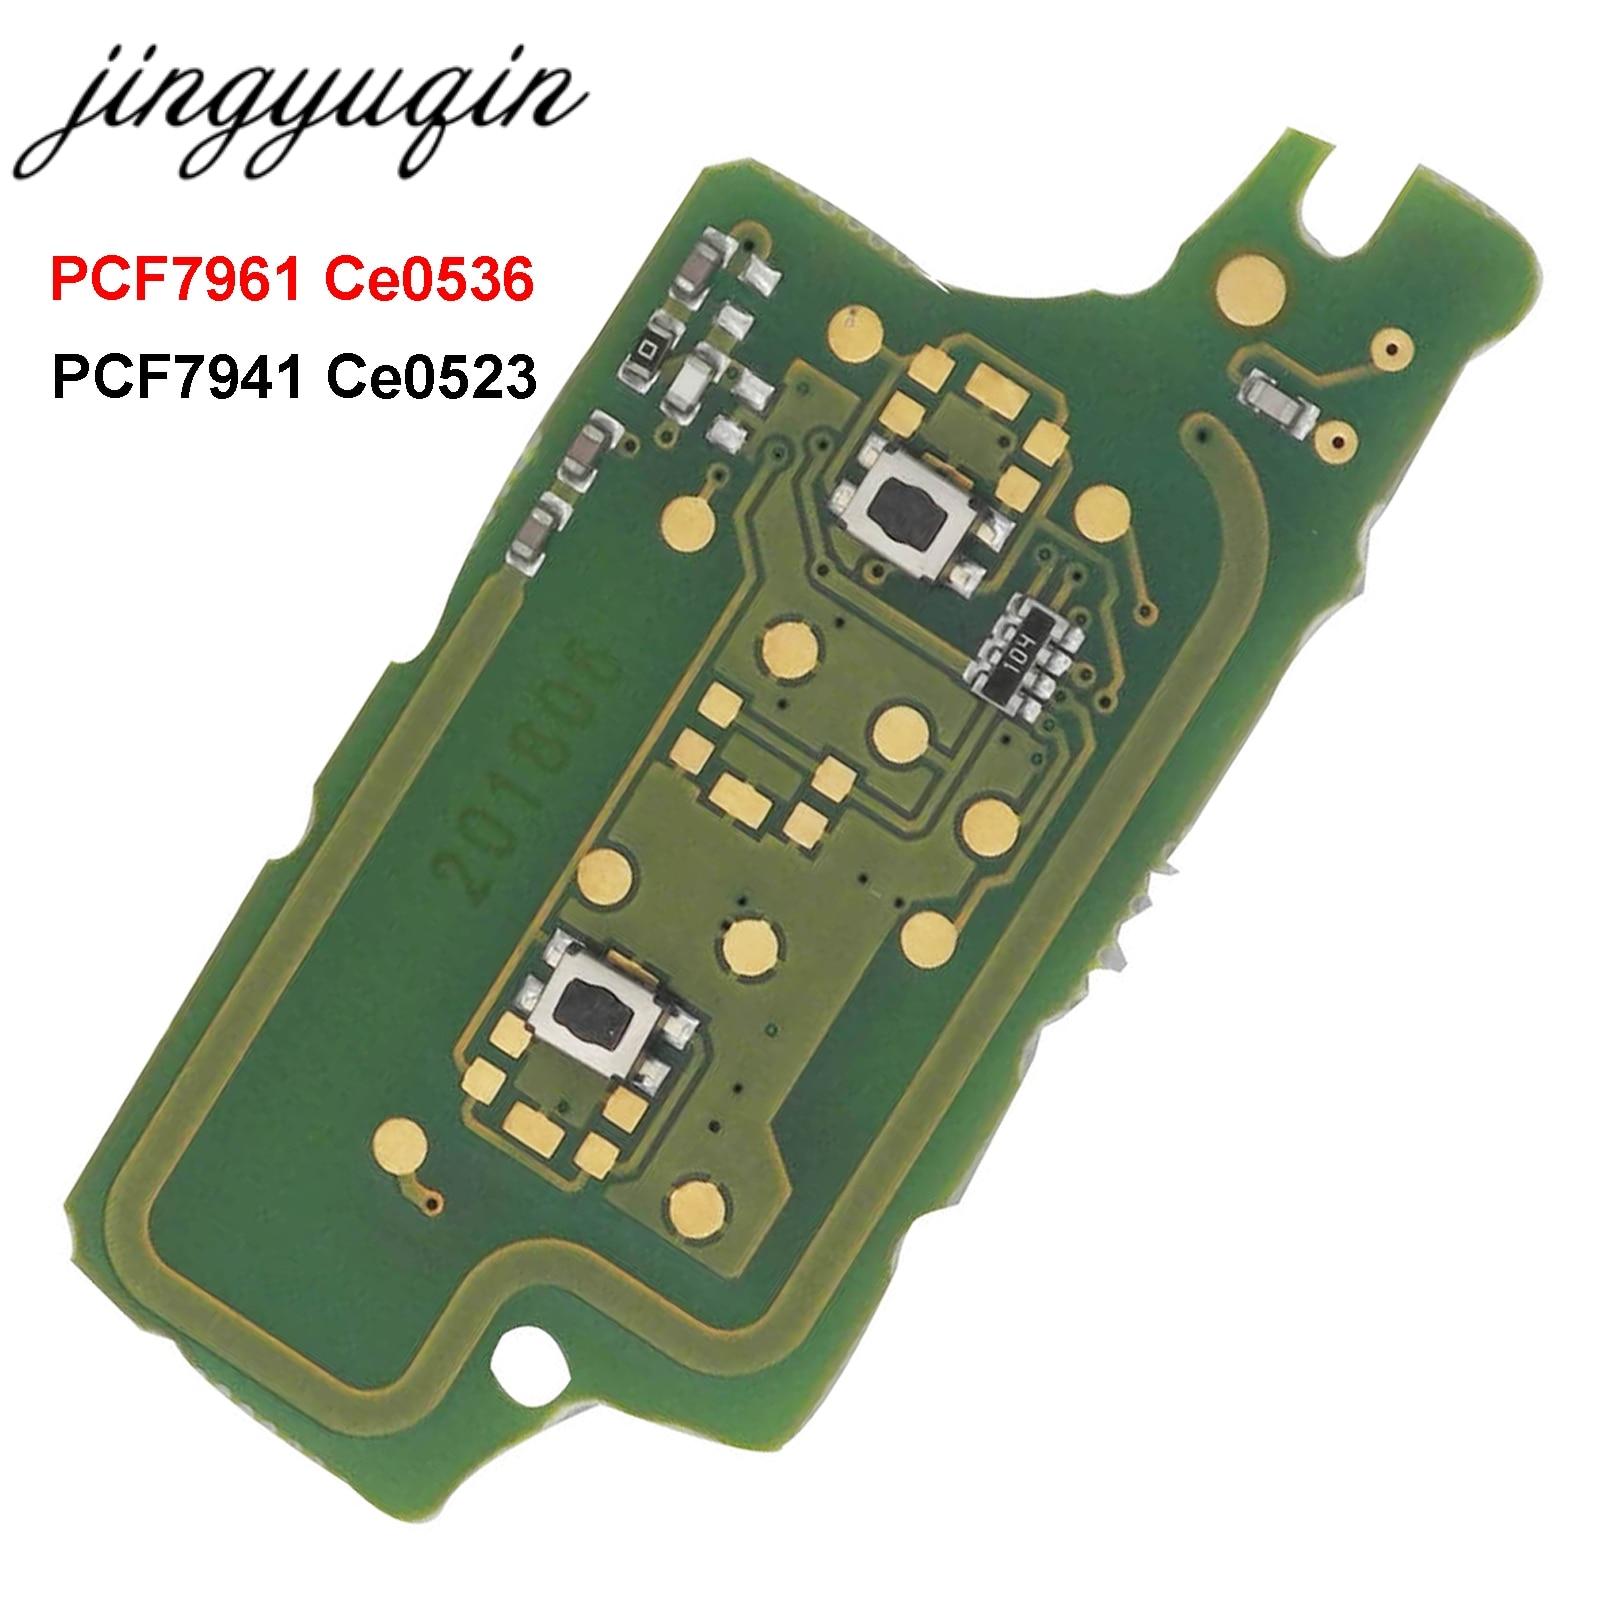 Электронная плата с дистанционным управлением jingyuqin ASK 2B для Peugeot 307 308 408 407 207 Citroen C2 C3 C4 PICASSO ID46 CE0536/523